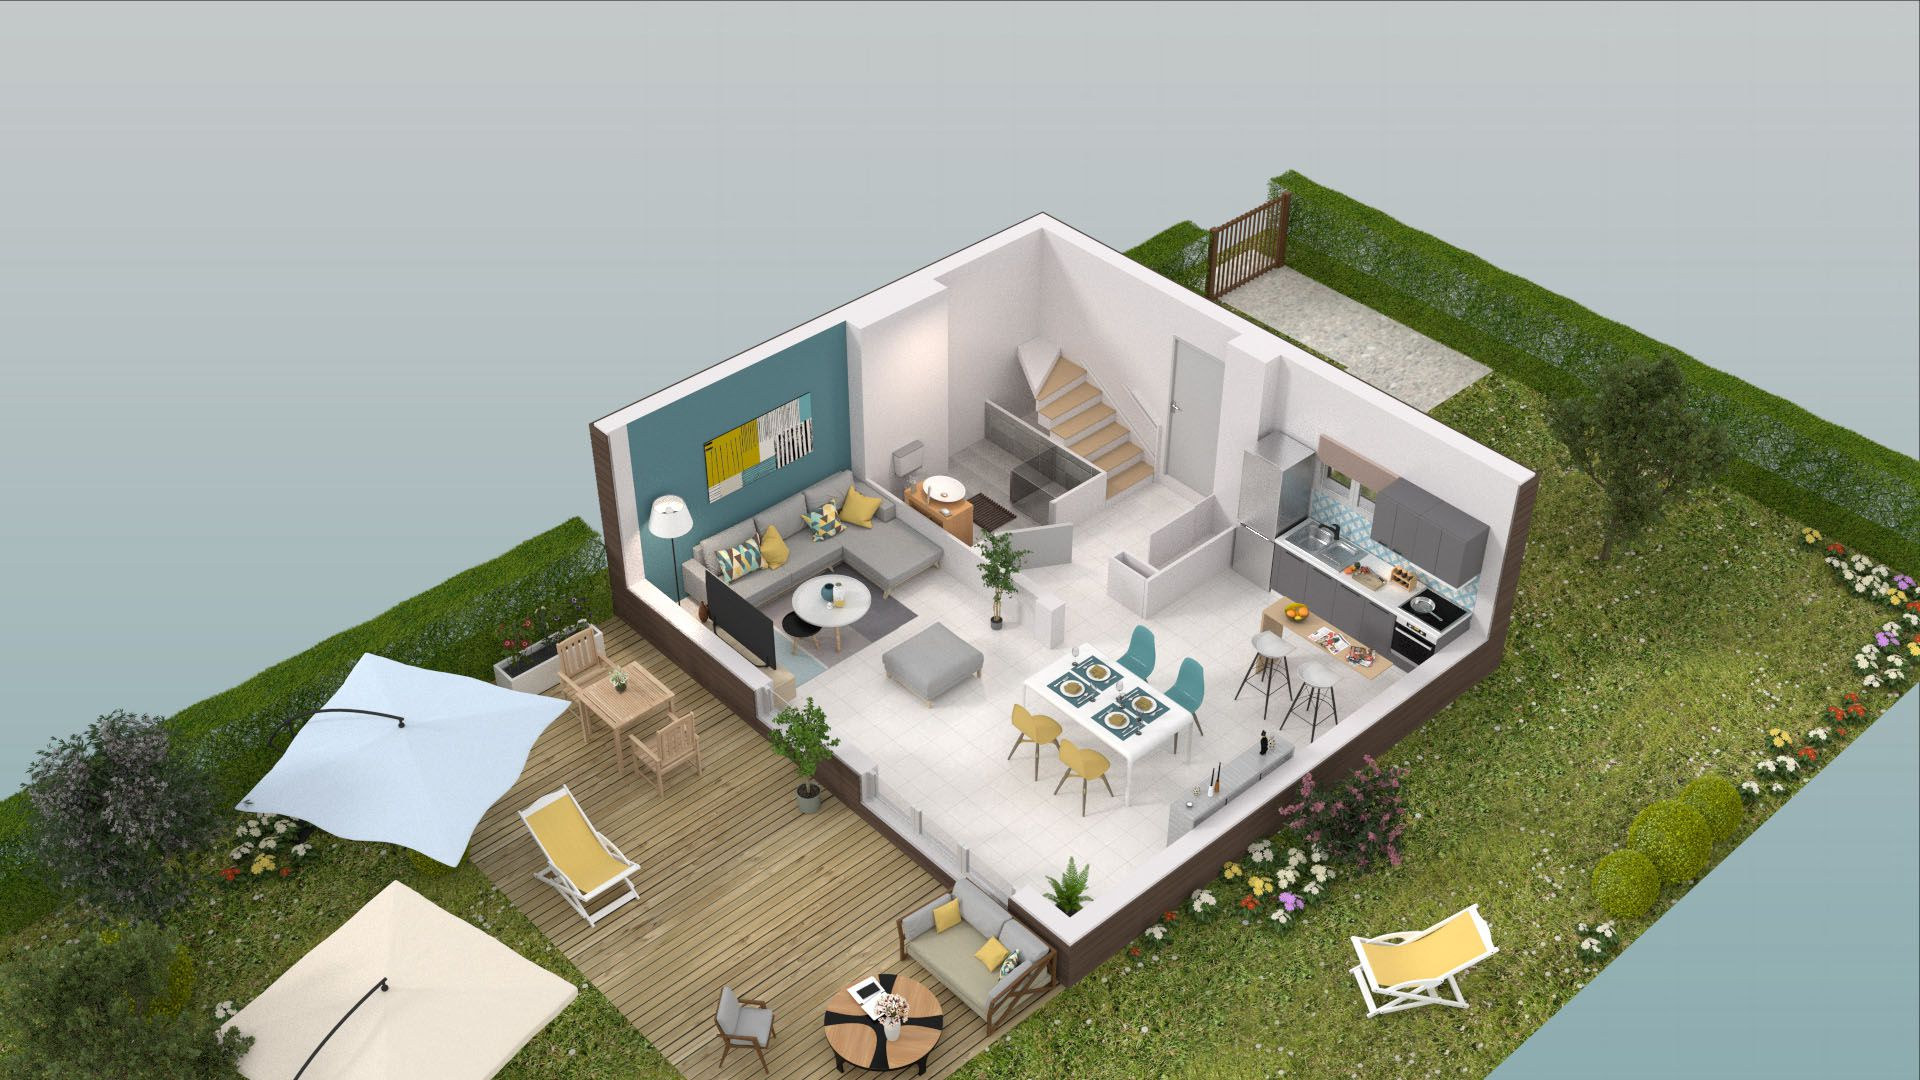 programme maison neuve ile de france ventana blog. Black Bedroom Furniture Sets. Home Design Ideas